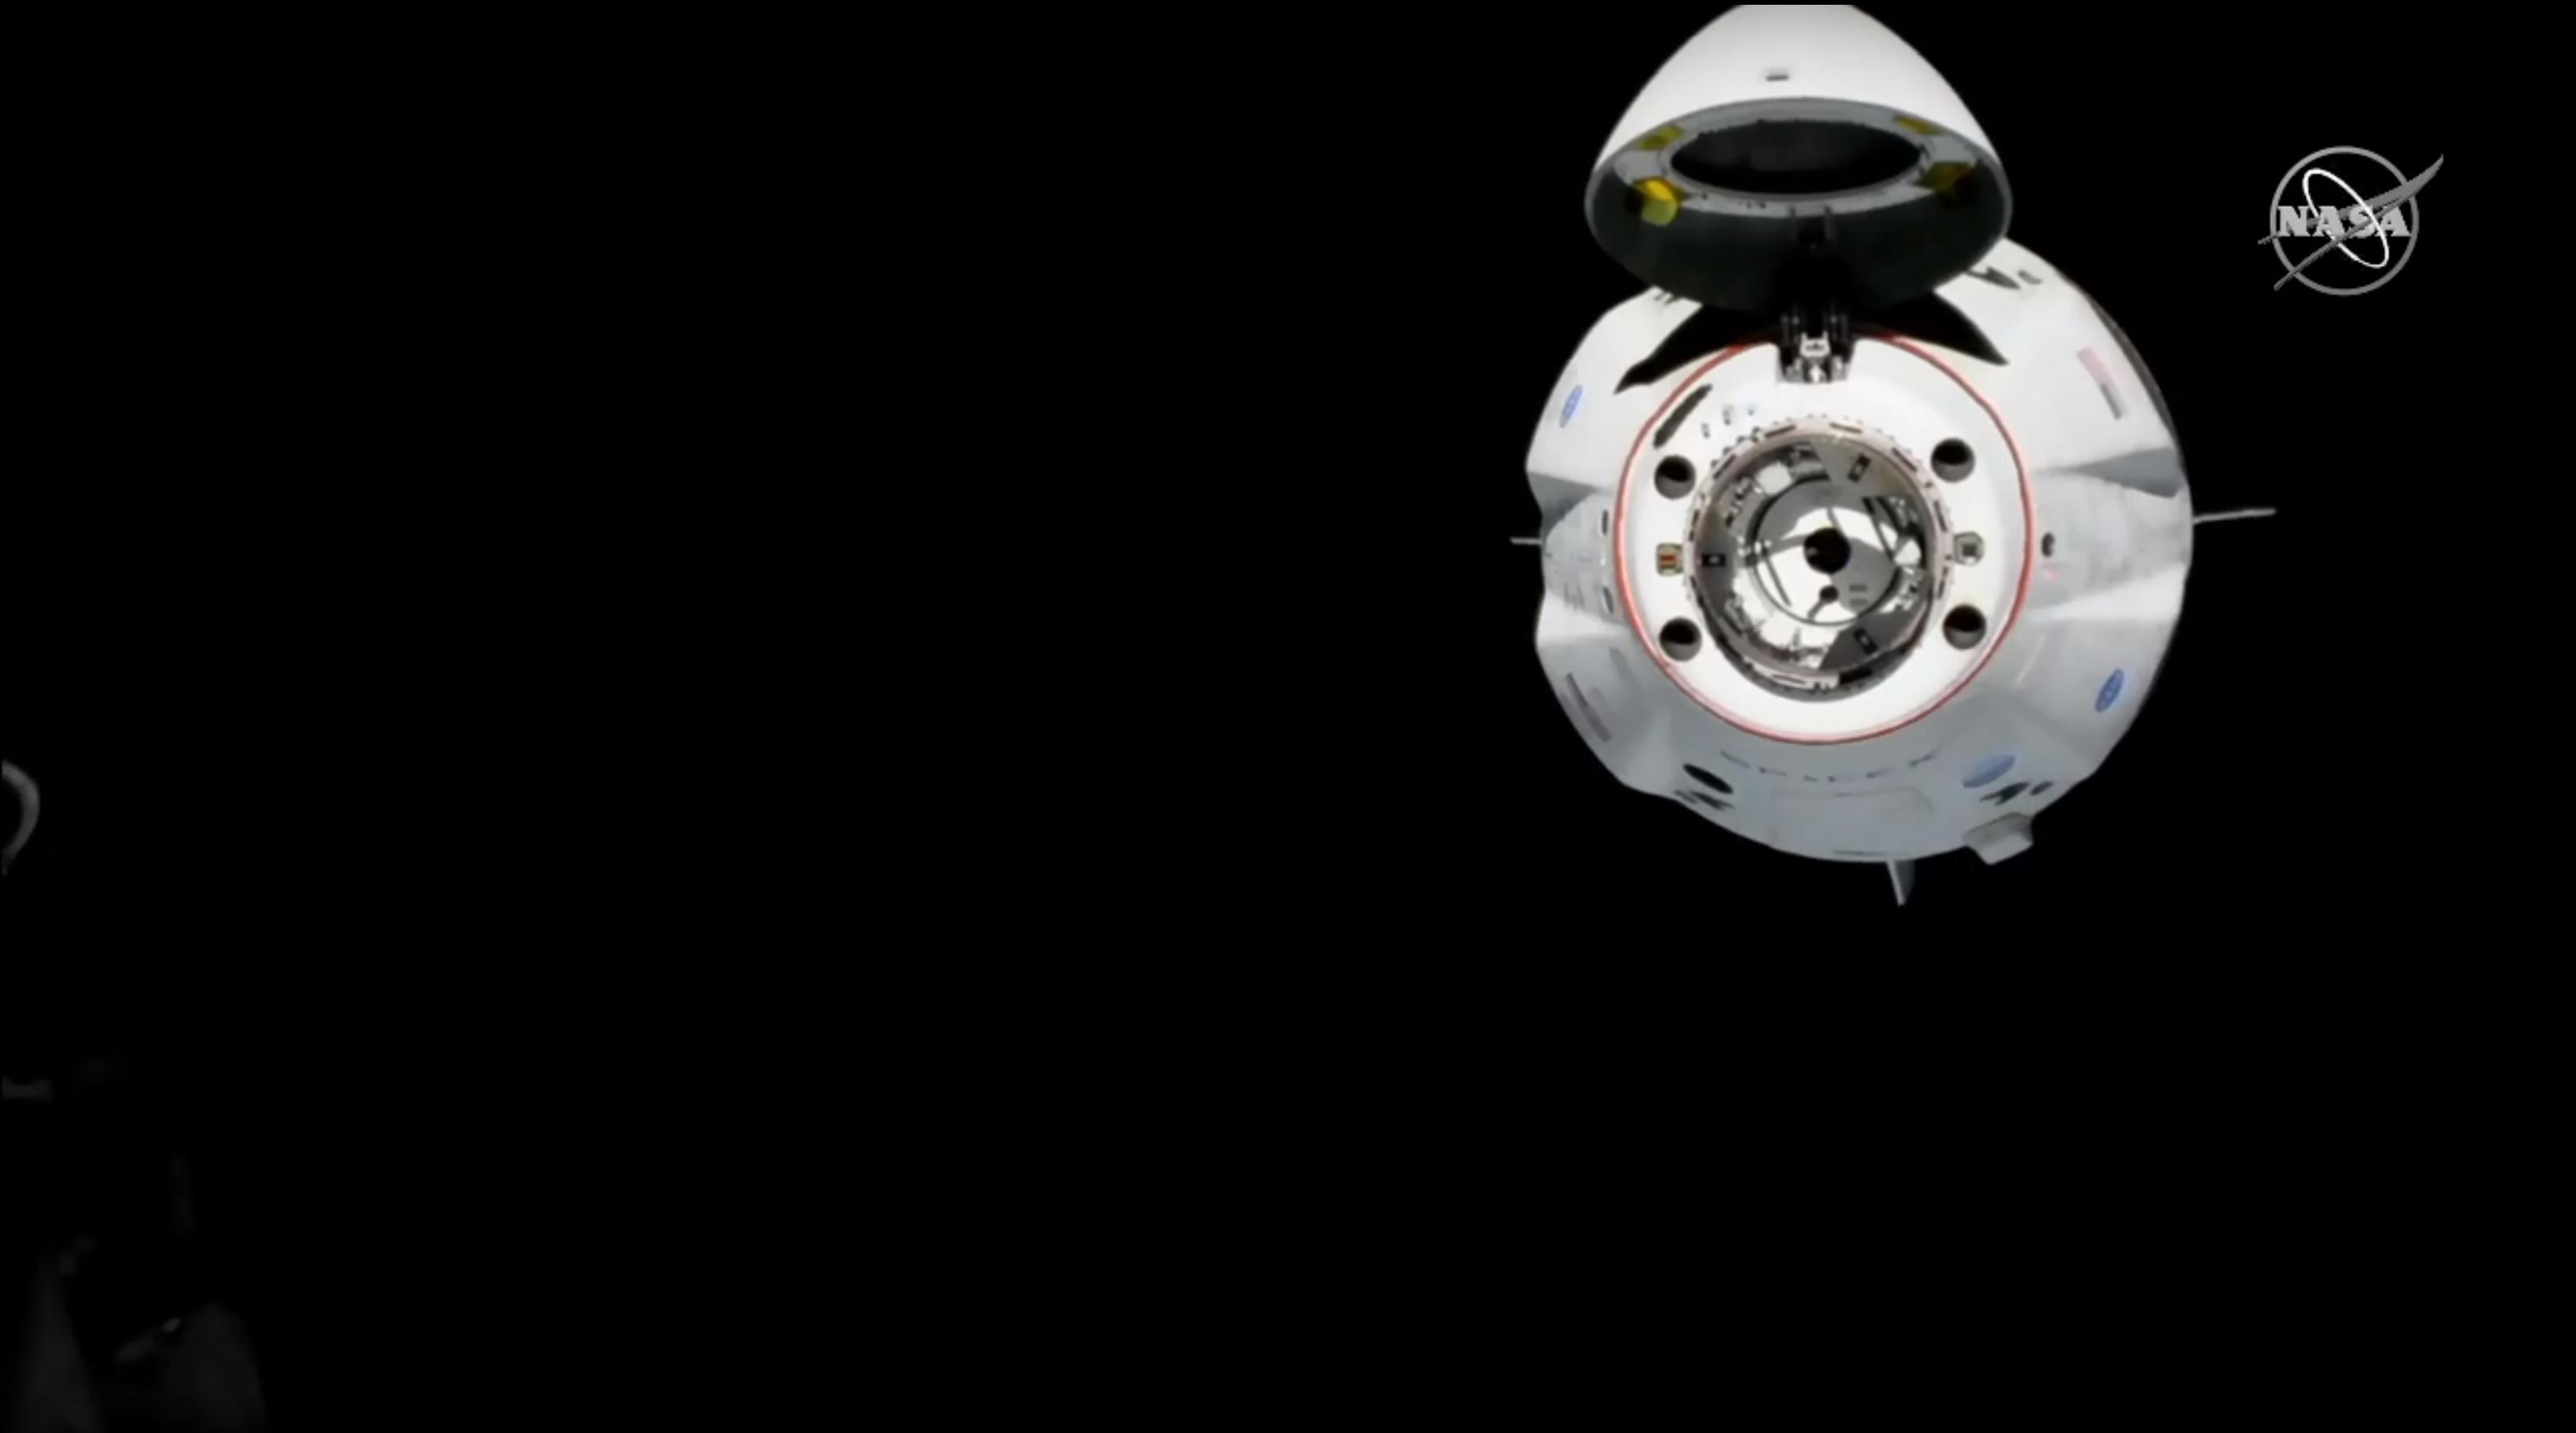 Crew Dragon DM-1 ISS arrival 030319 (NASA) 3